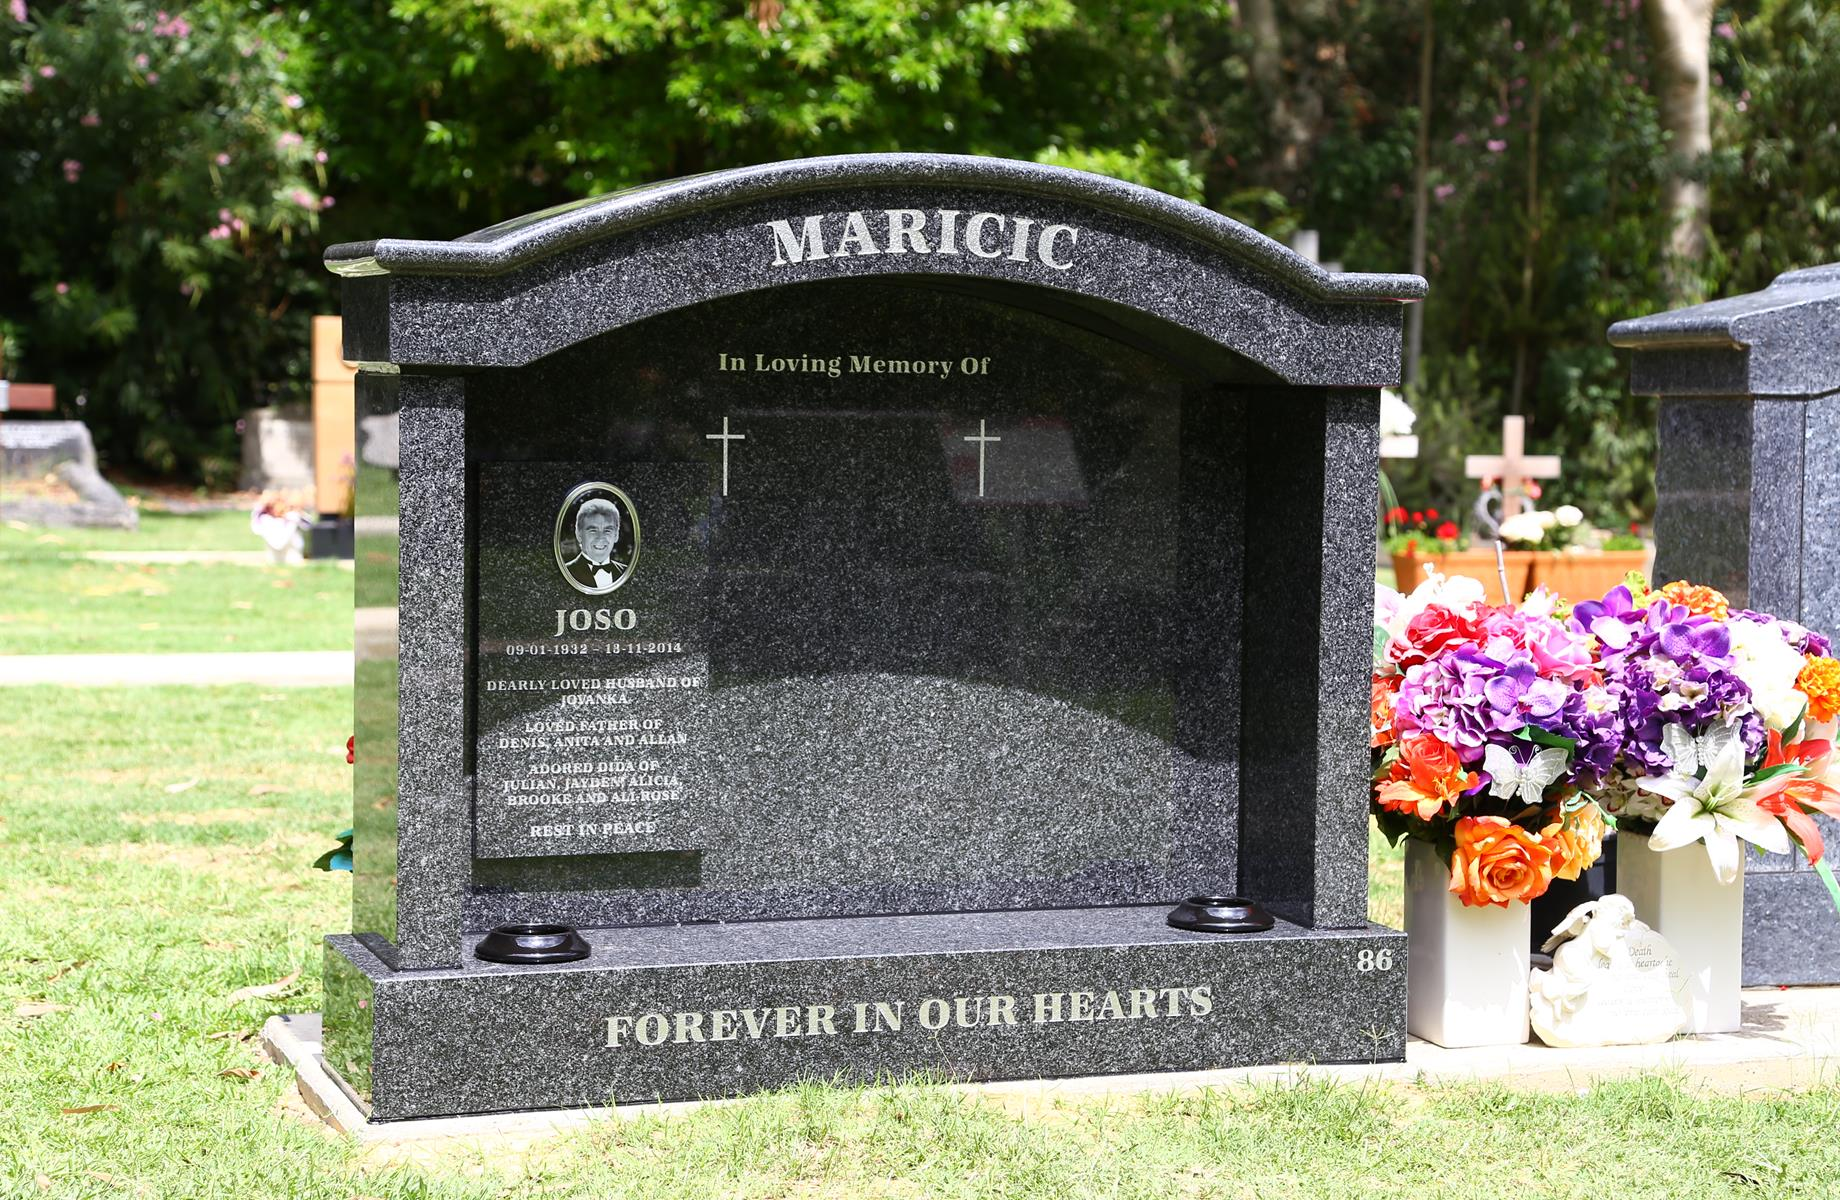 Maricic